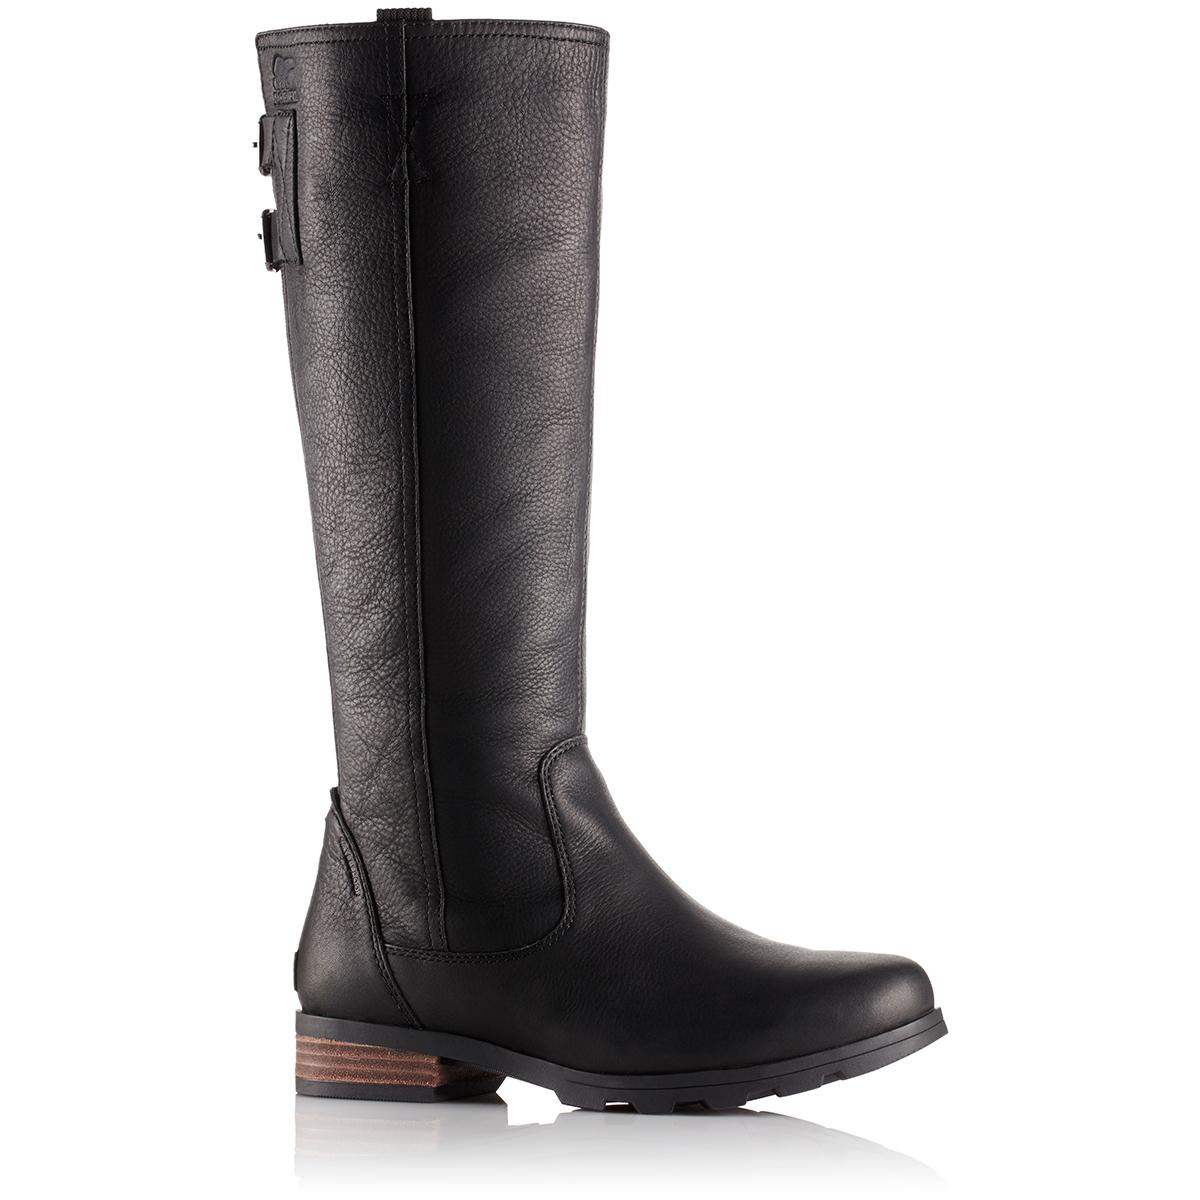 Sorel Women's Emelie Tall Premium Waterproof Boots, Black